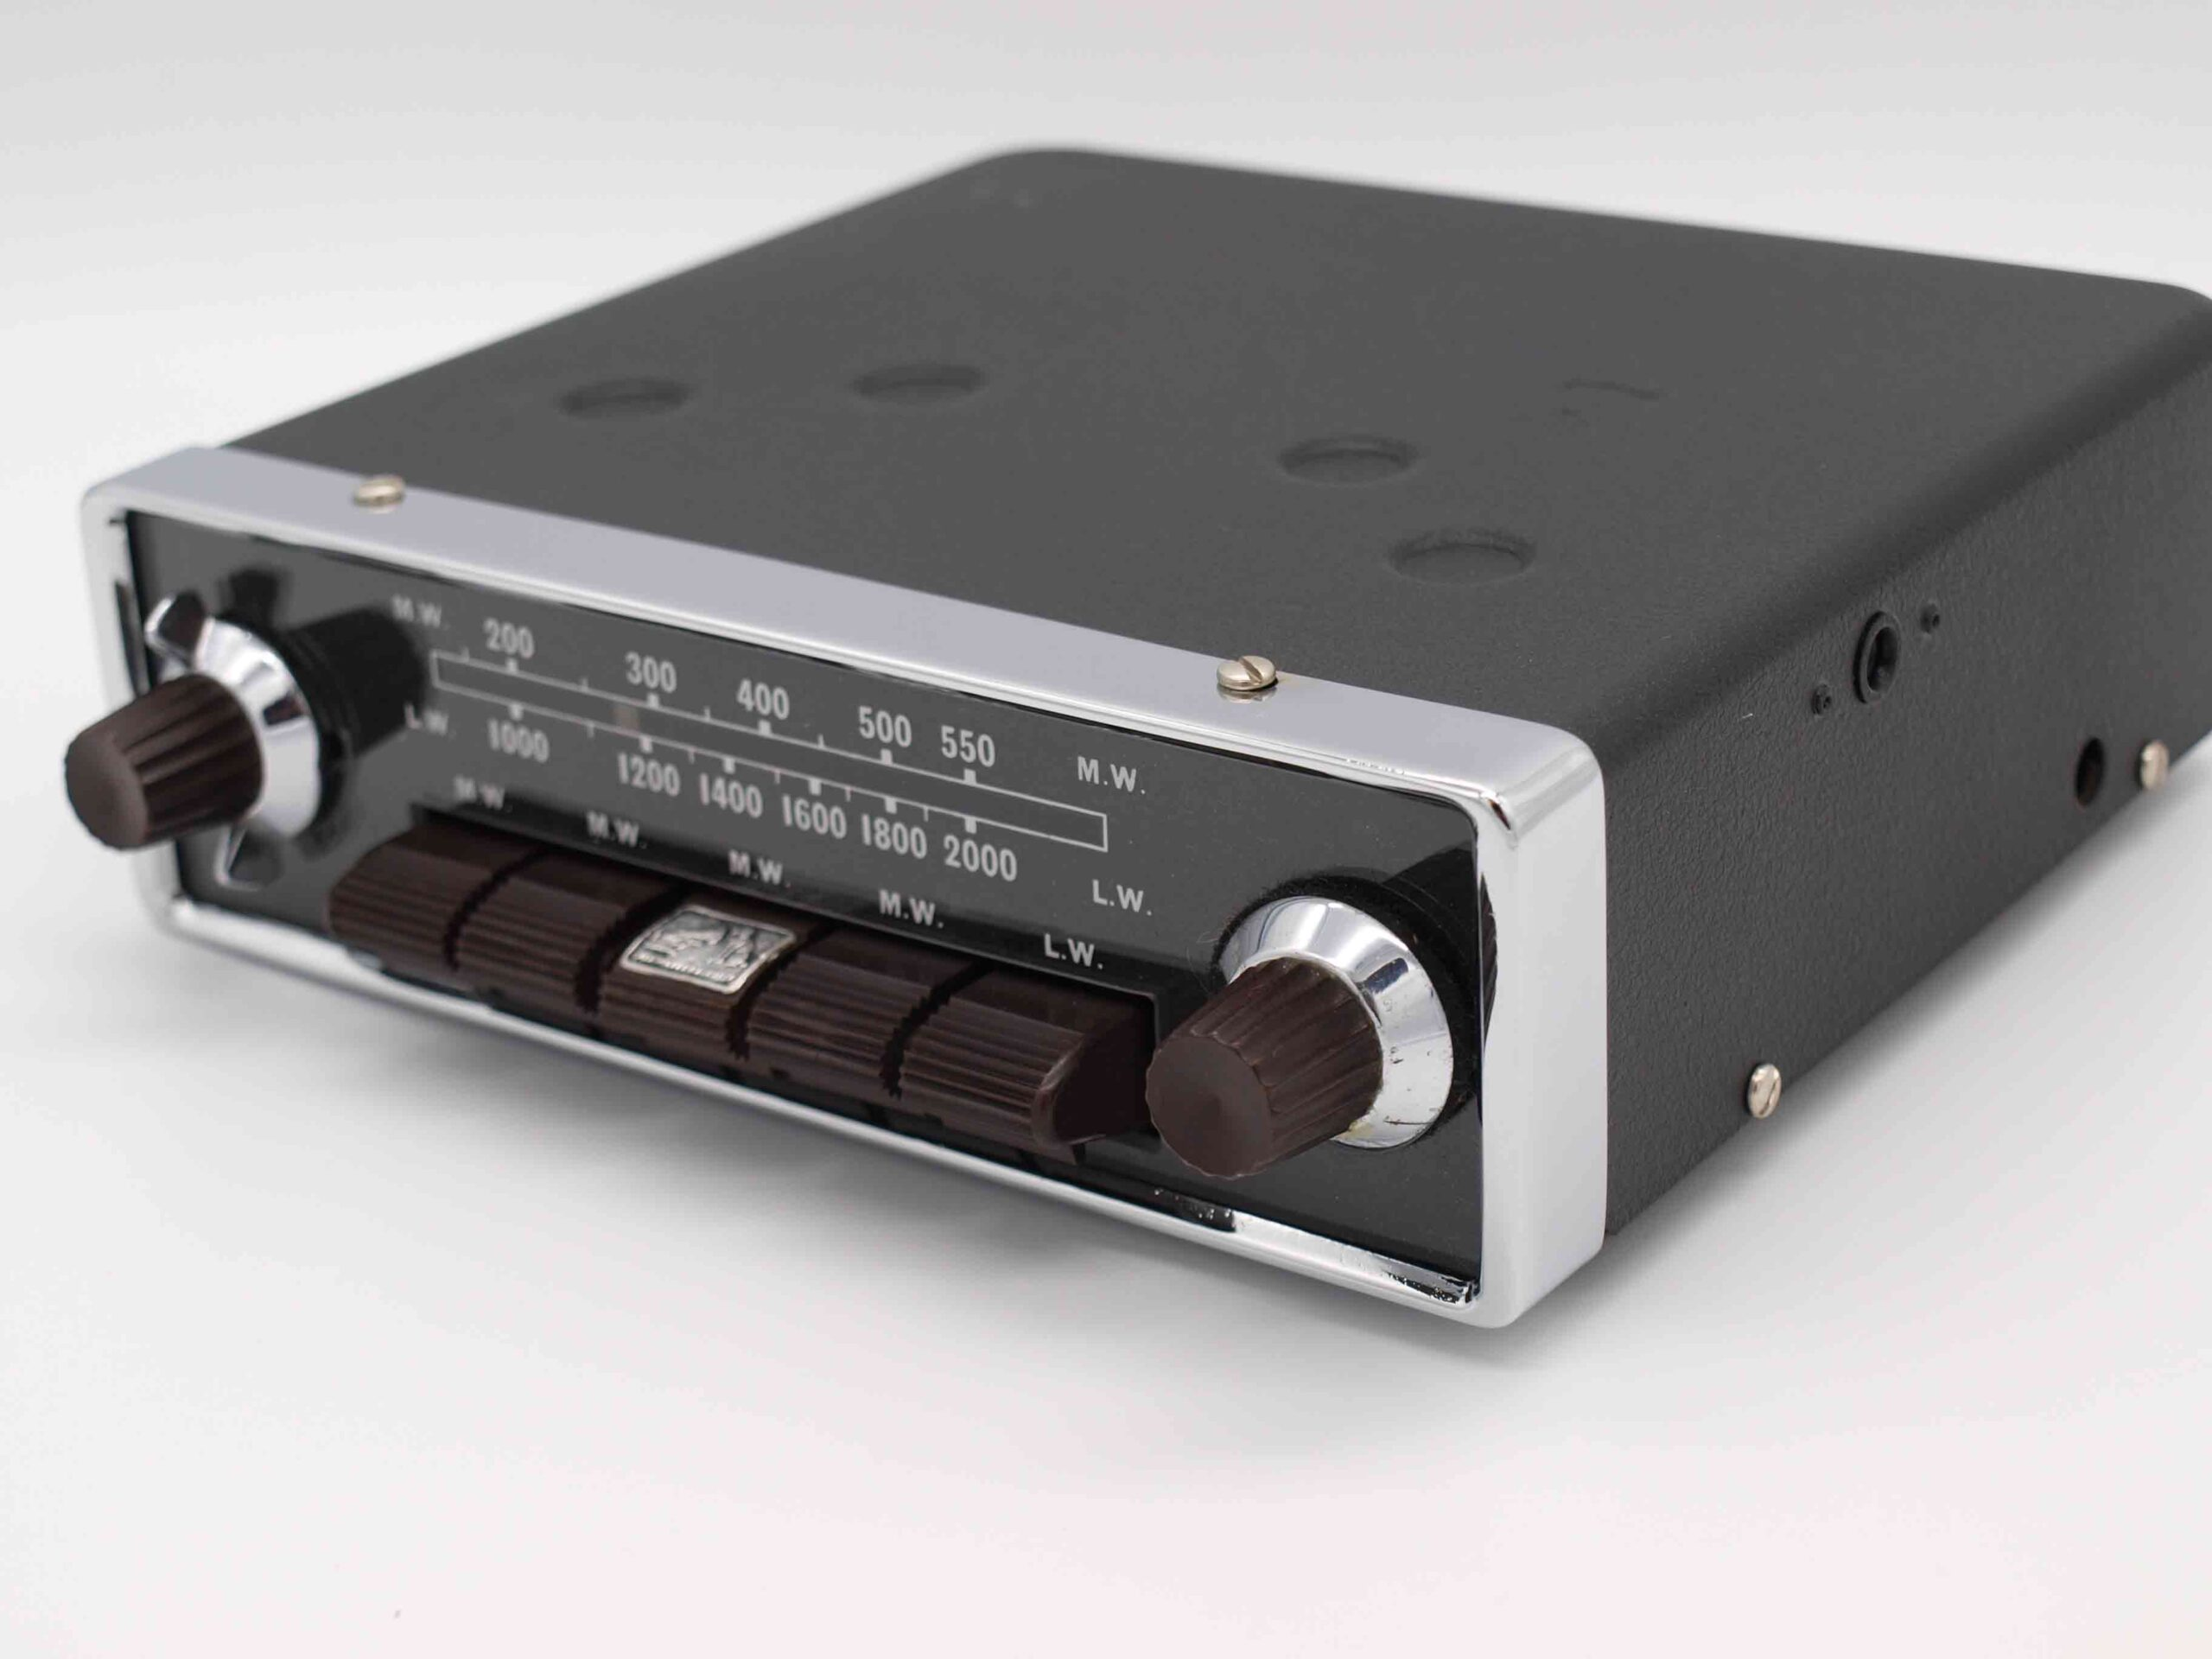 Radiomobile (HMV) 4200